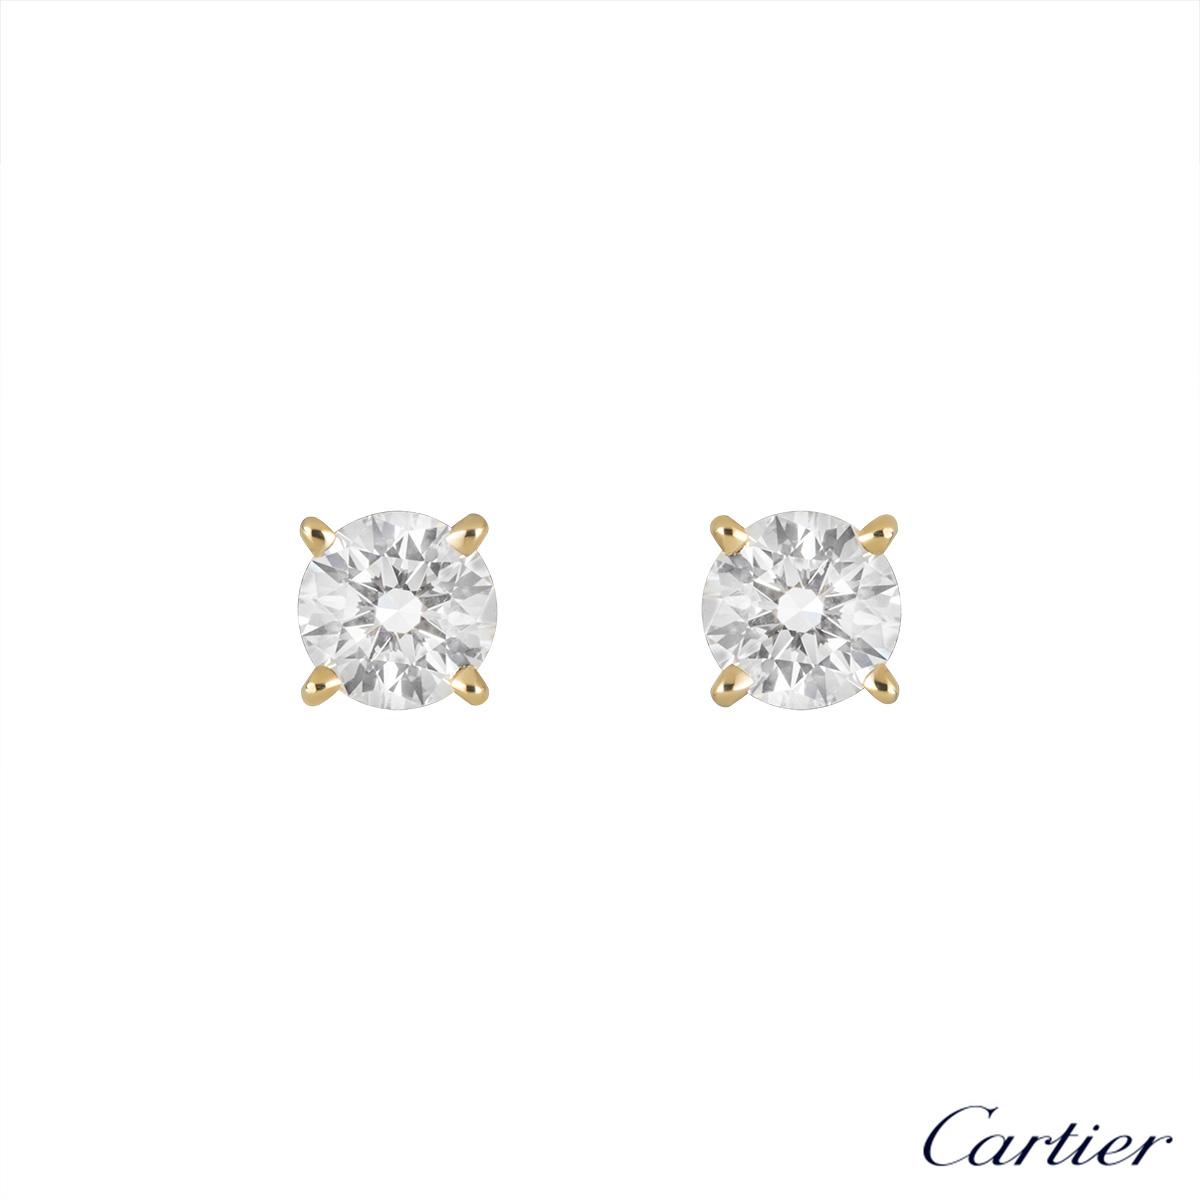 9fa8fbc41c593 Cartier Diamond Earrings